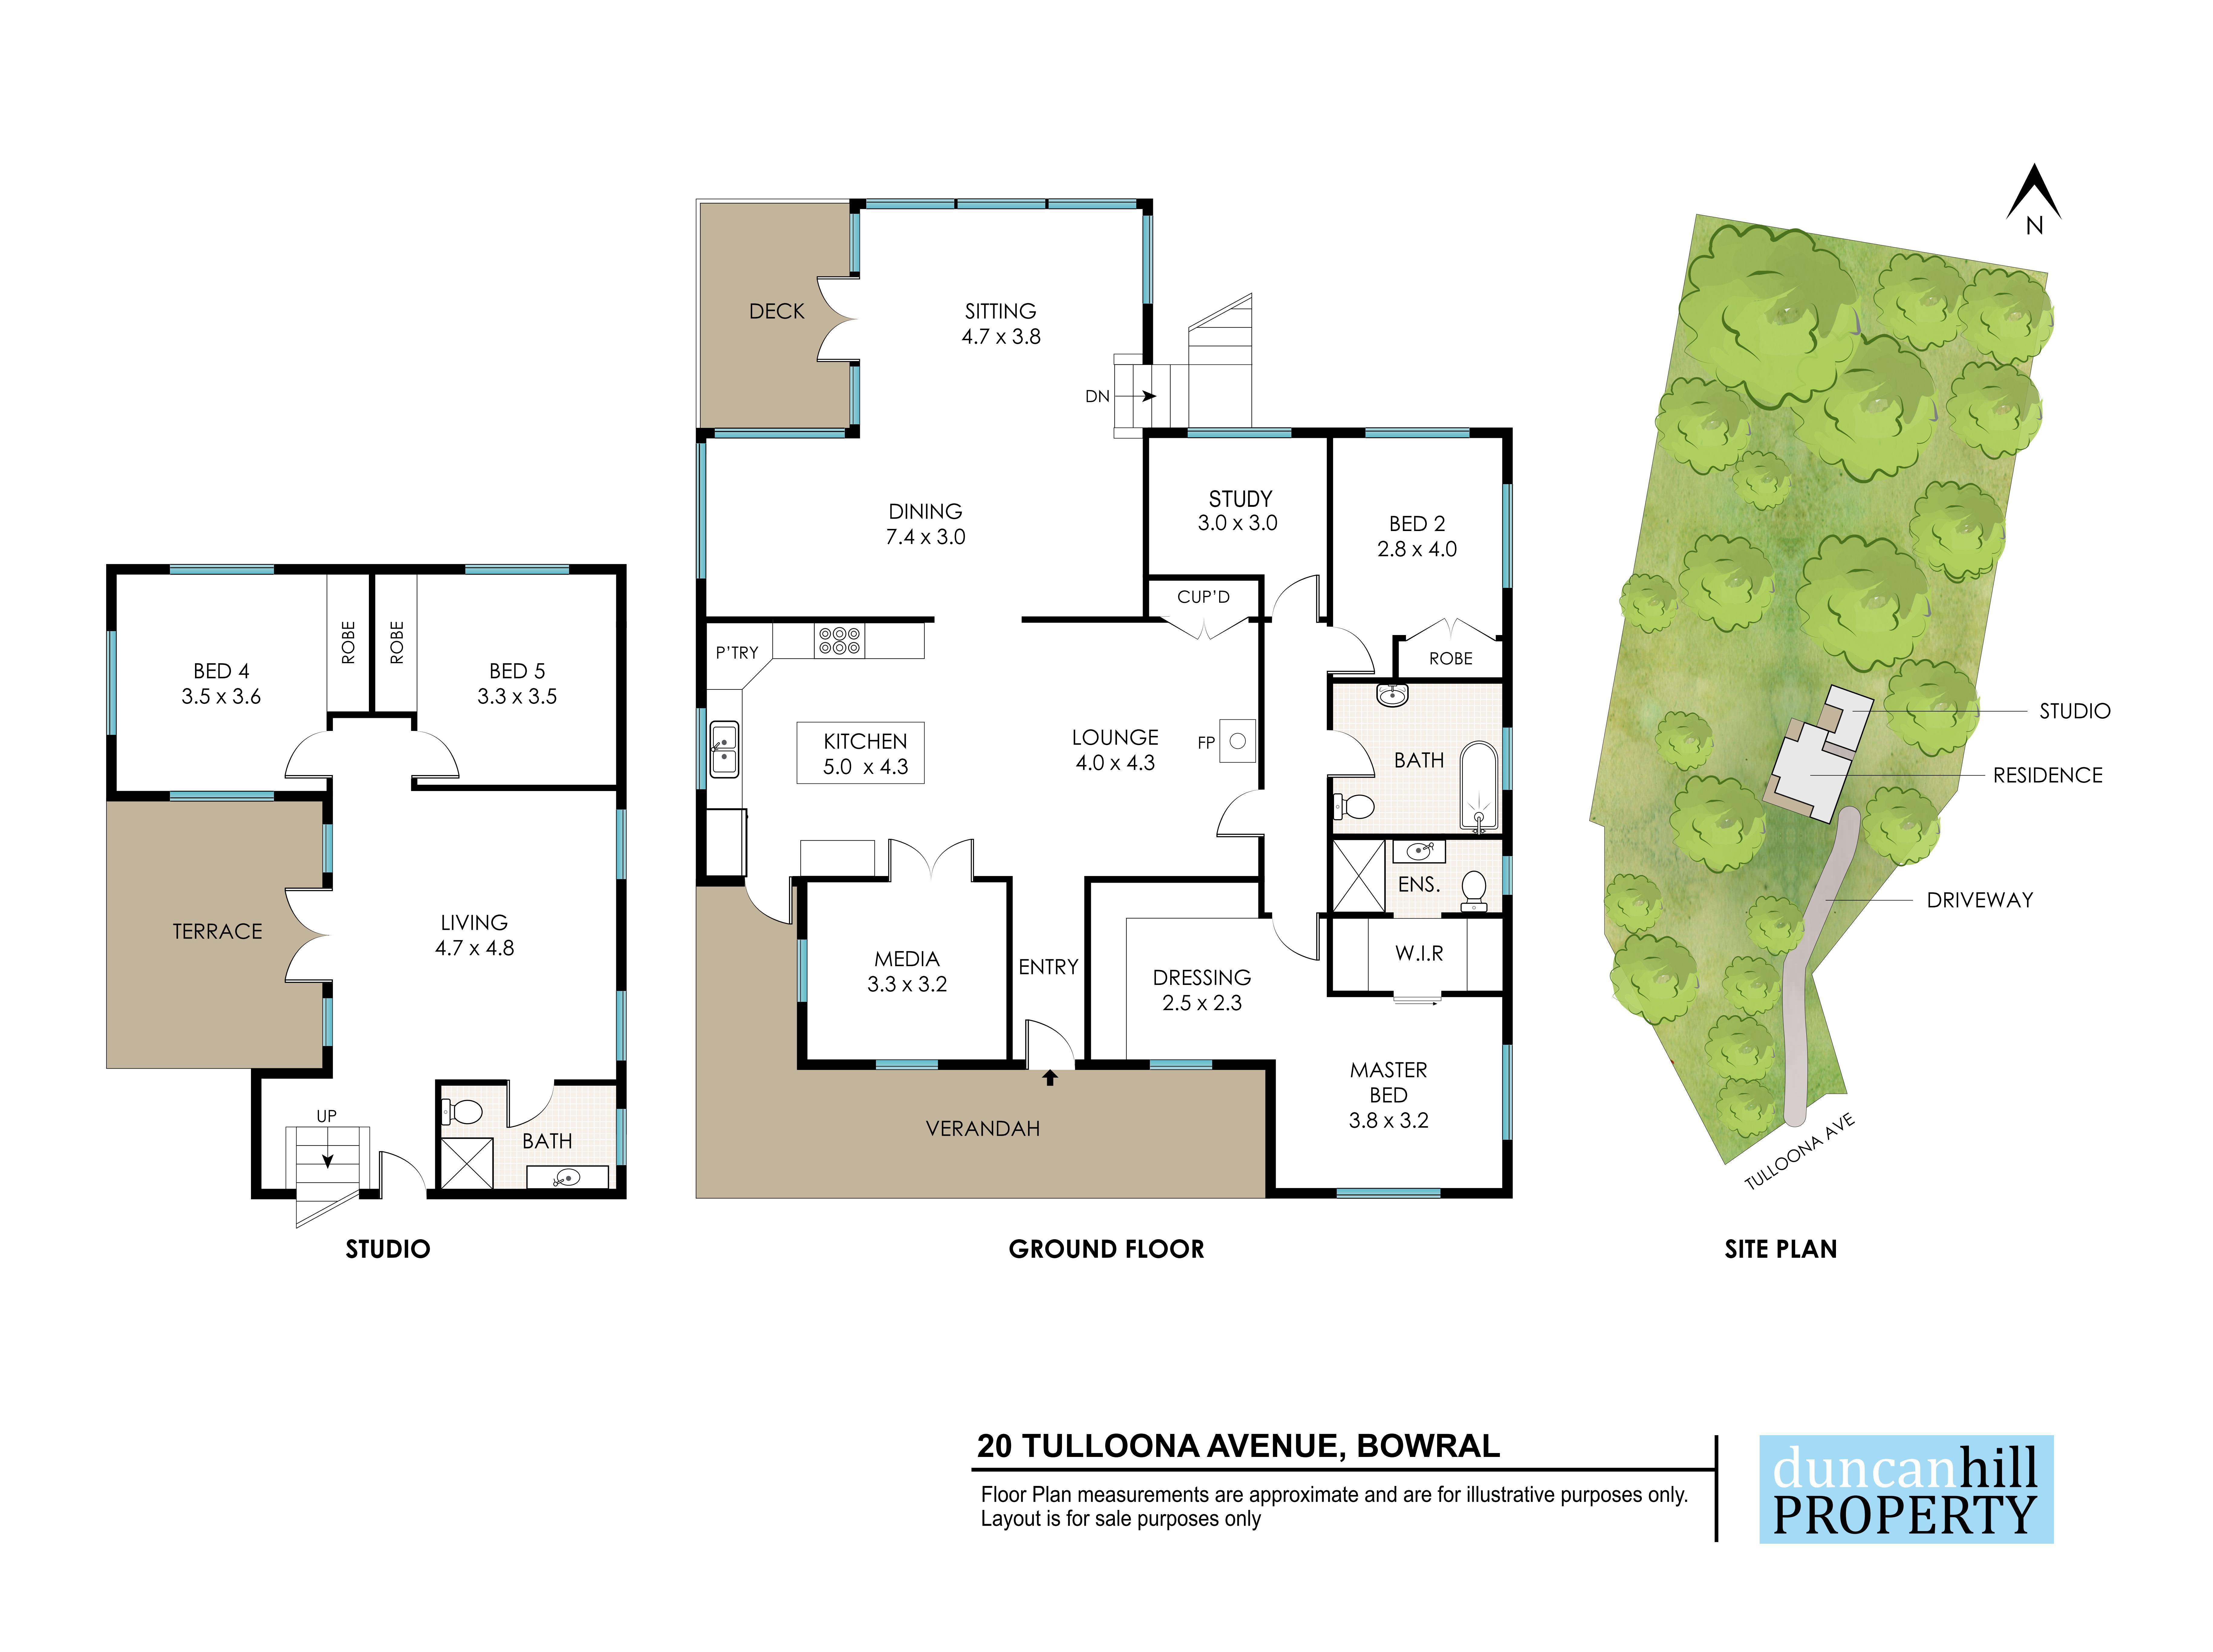 http://assets.boxdice.com.au/duncan_hill_property/listings/1676/0b51f6da.jpg